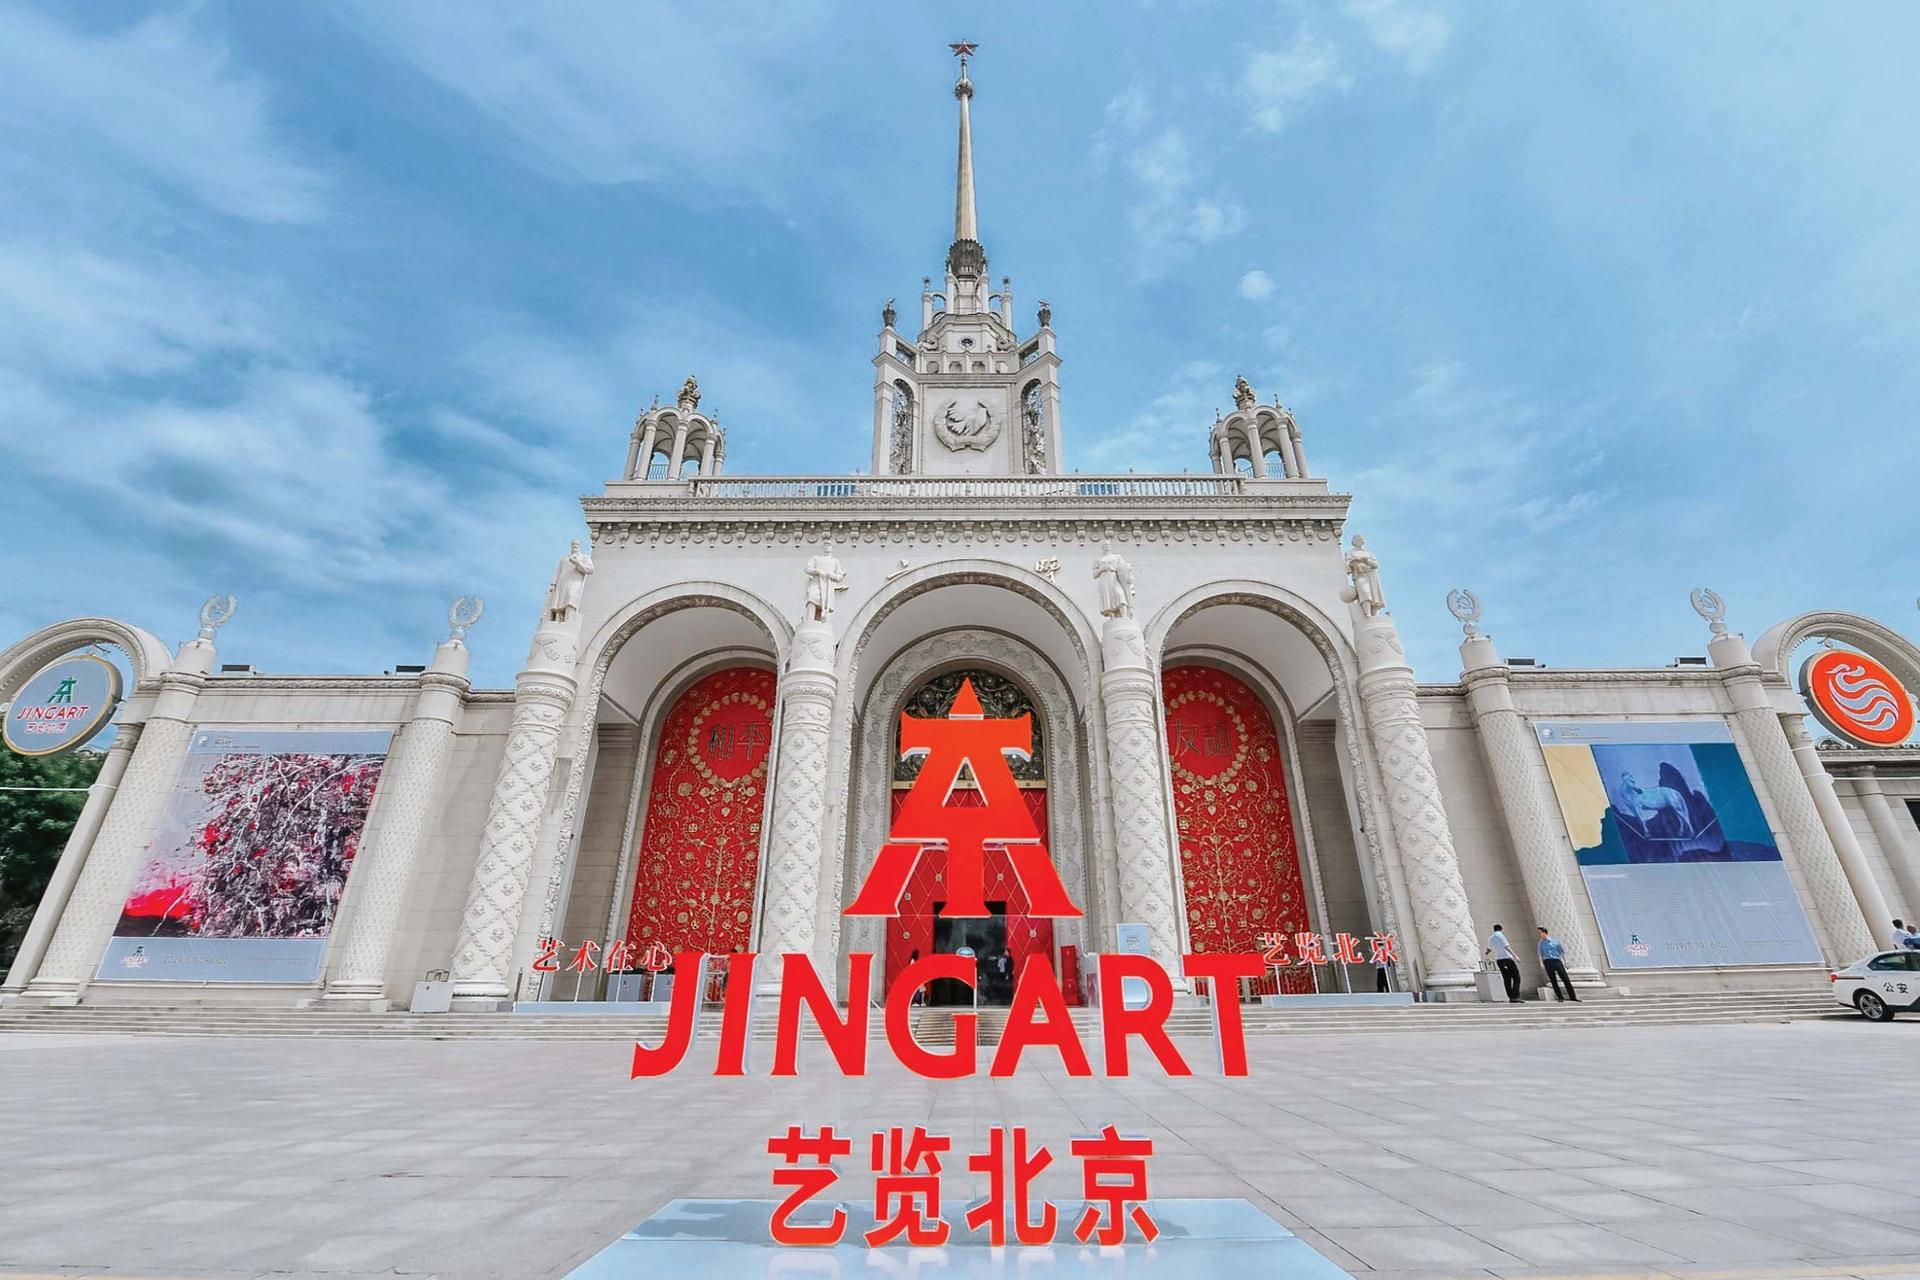 JingArt fair at the Beijing Exhibition Center Photo: JINGART